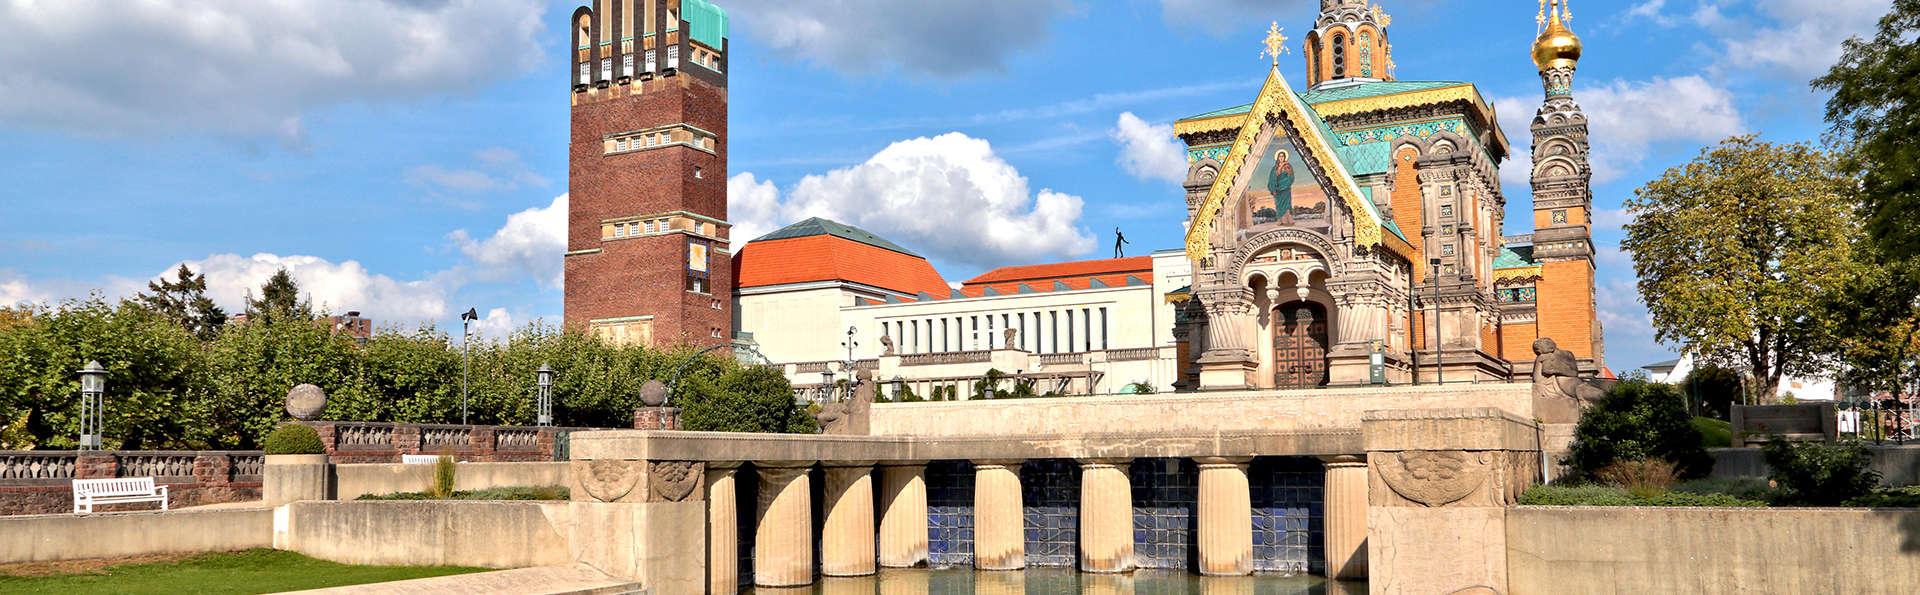 Best Western Plus Plaza Hotel Darmstadt - Edit_Darmstadt.jpg